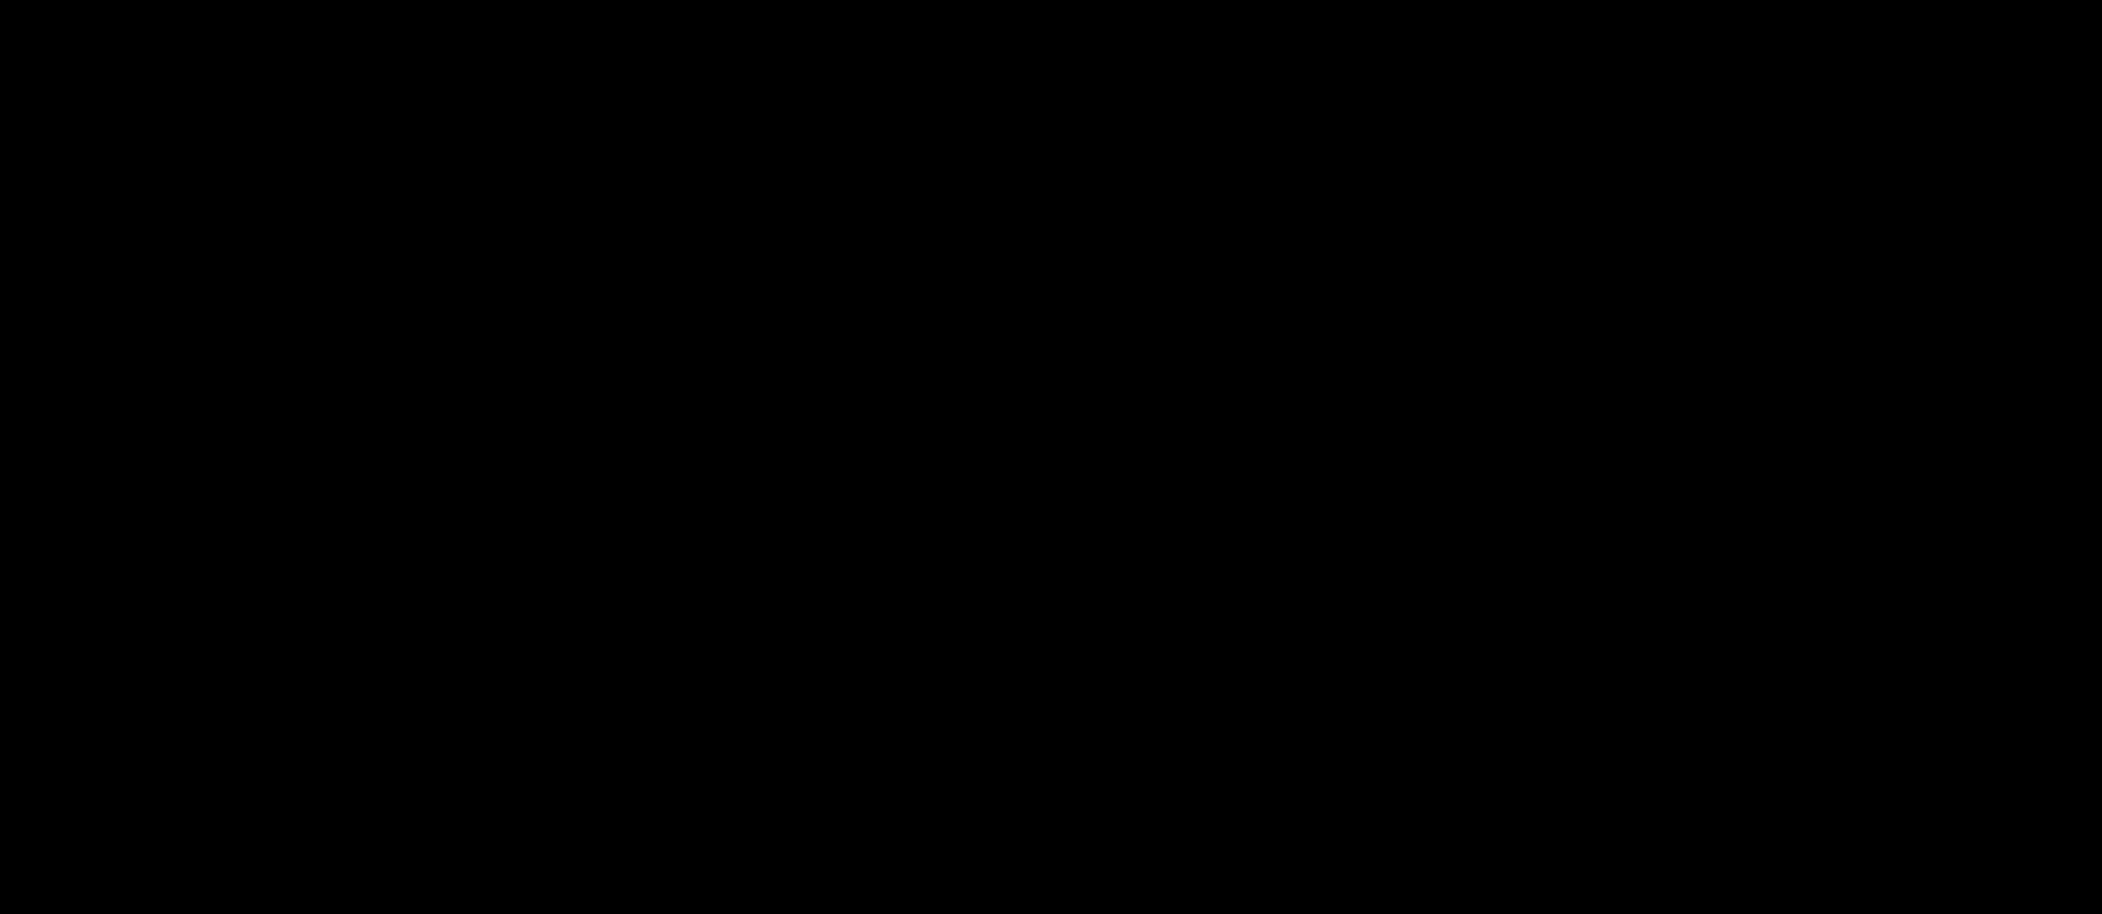 A black background.